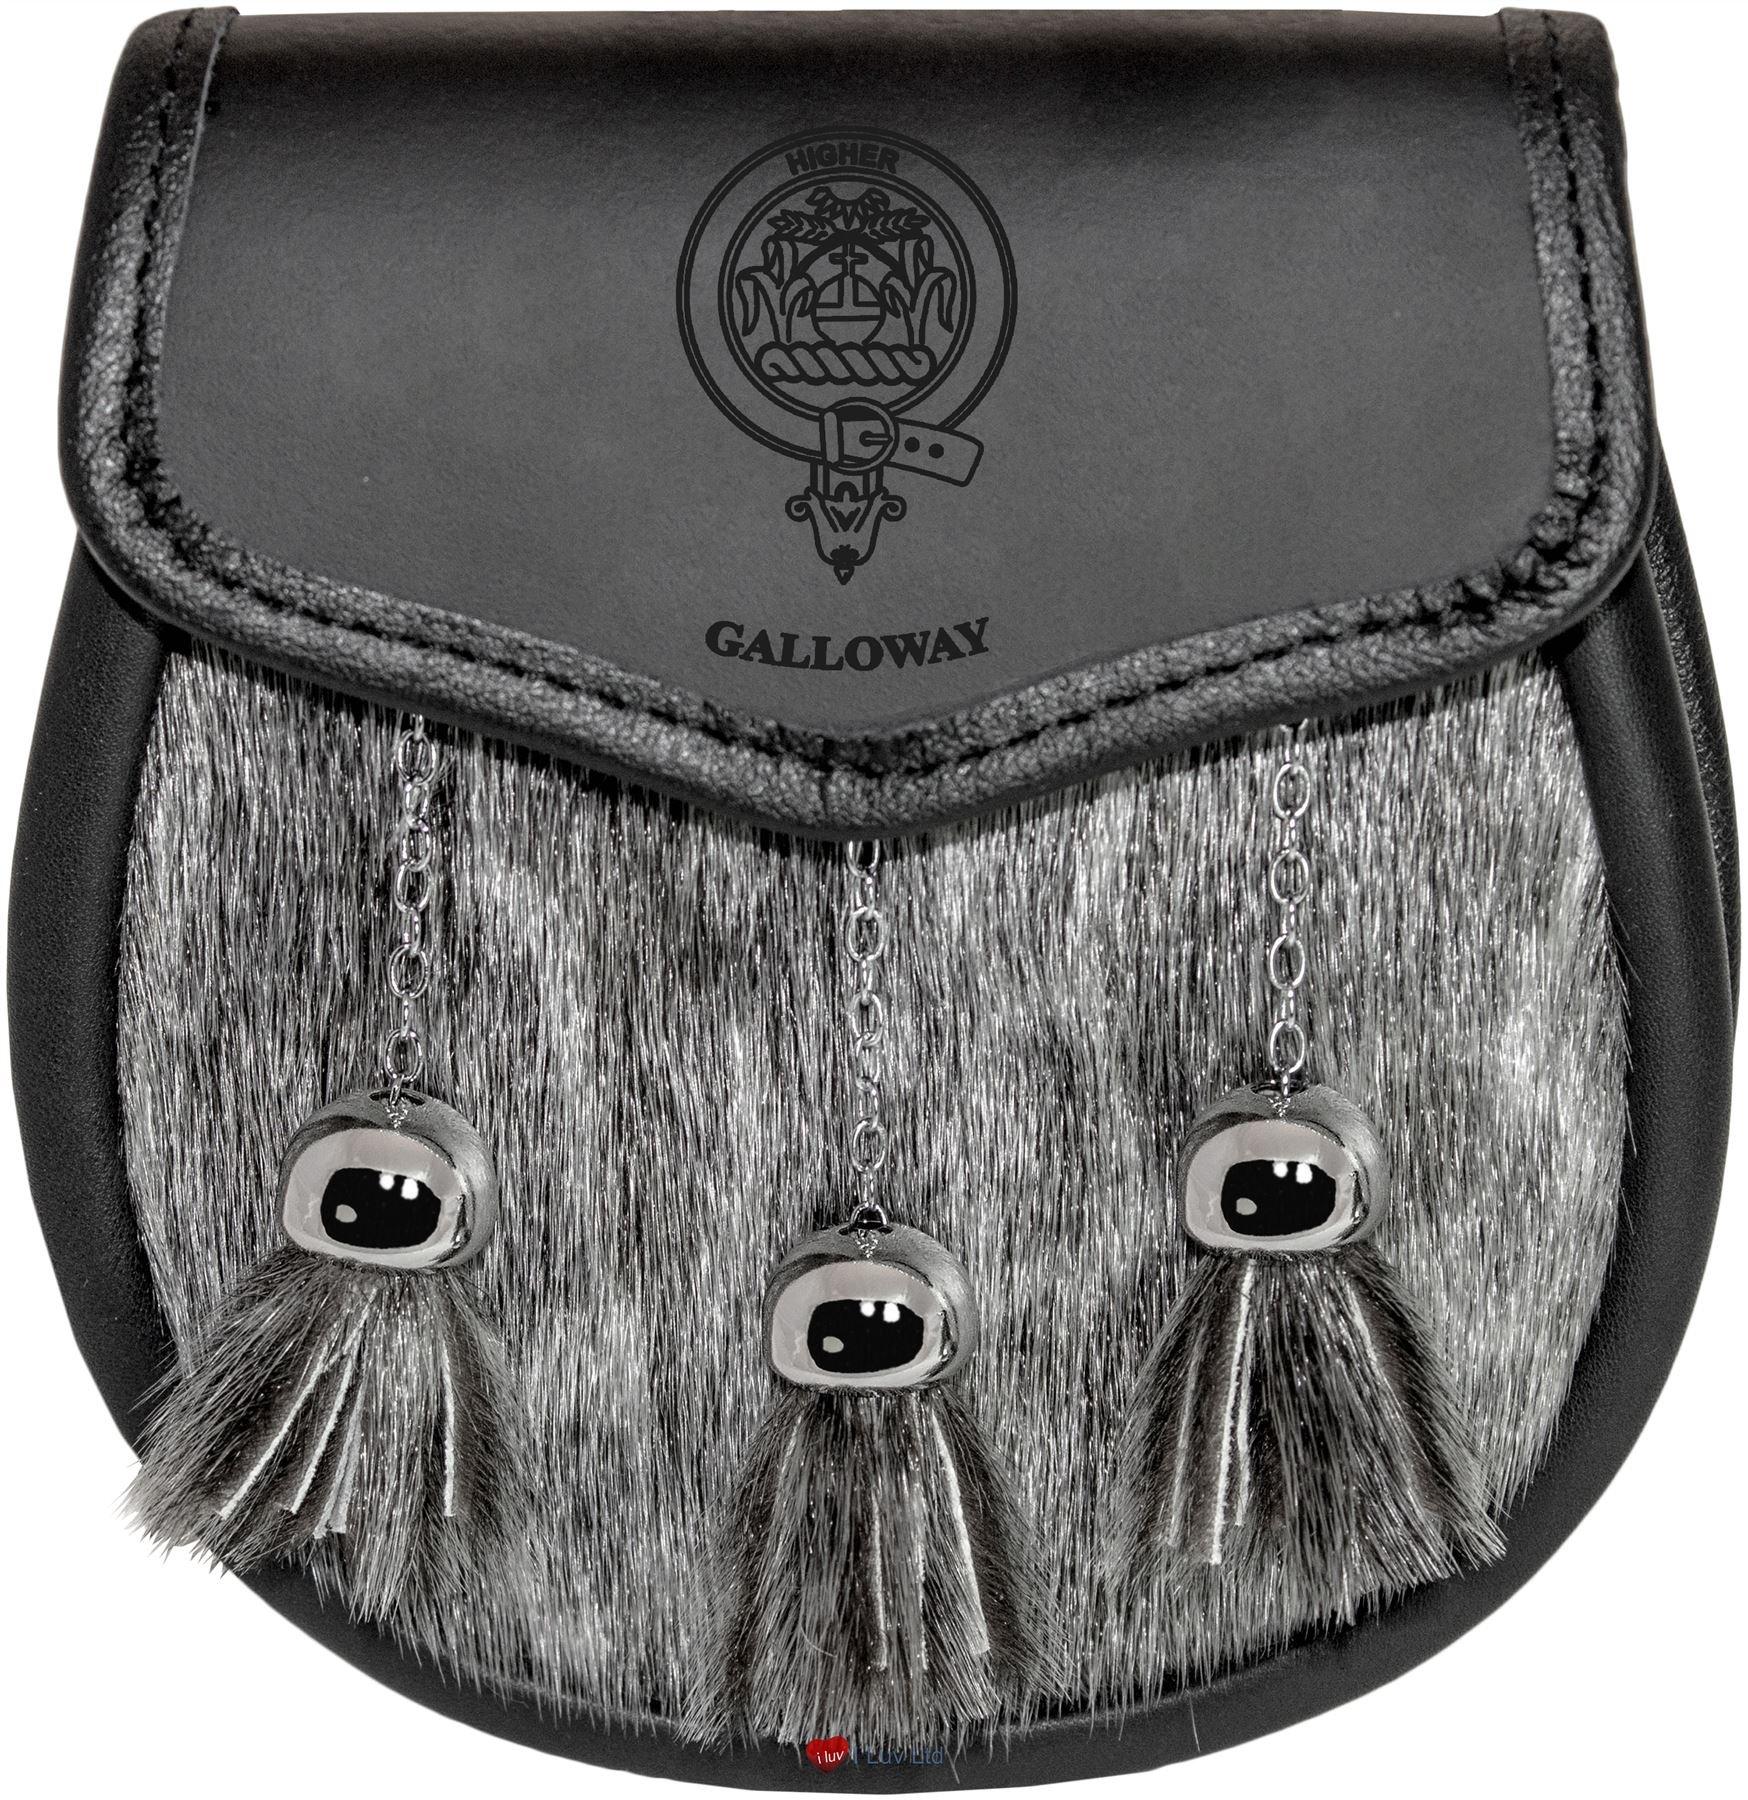 Galloway Semi Dress Sporran Fur Plain Leather Flap Scottish Clan Crest